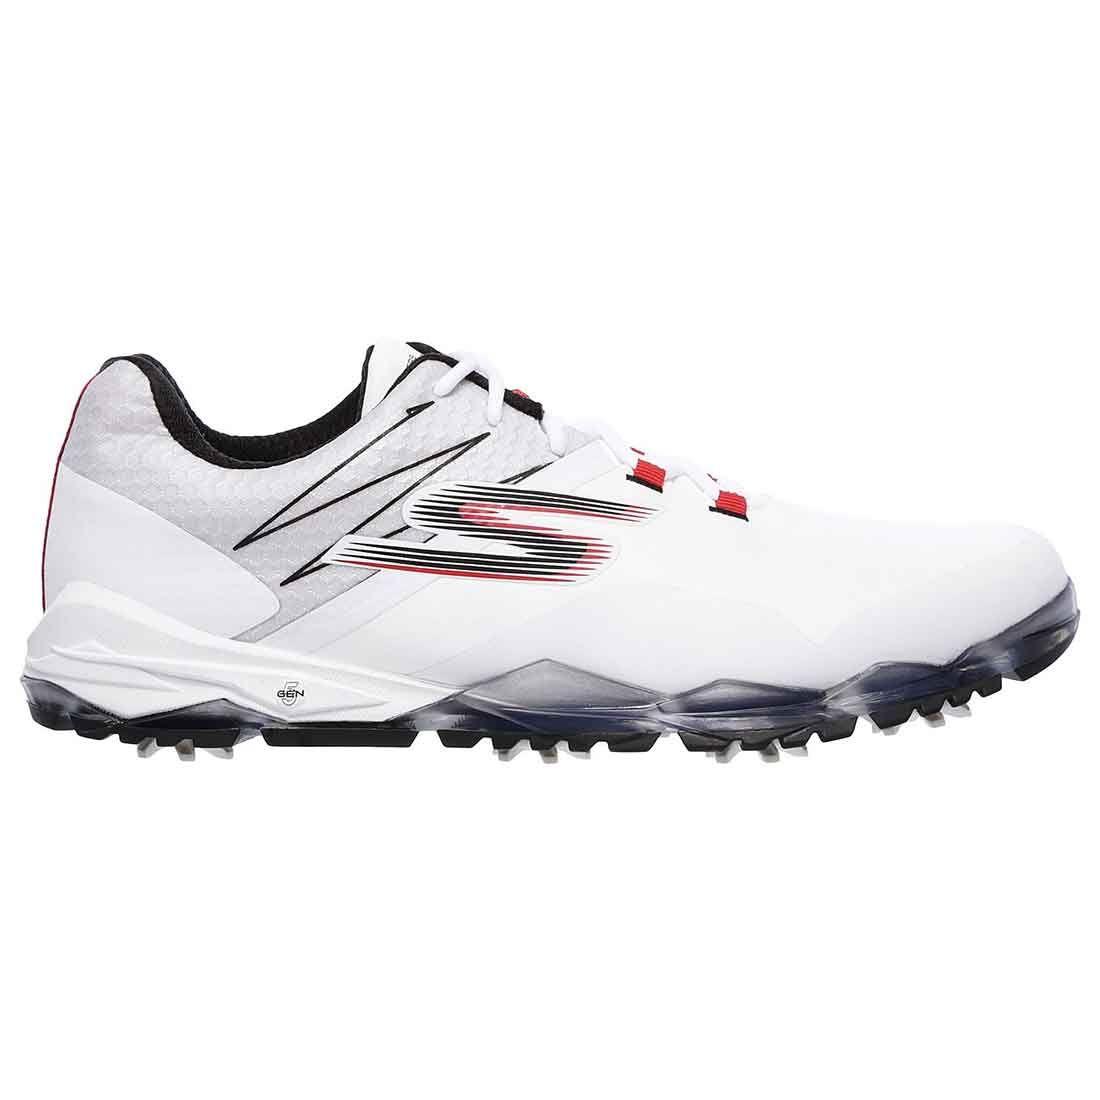 Skechers GO GOLF Focus Golf Shoes White